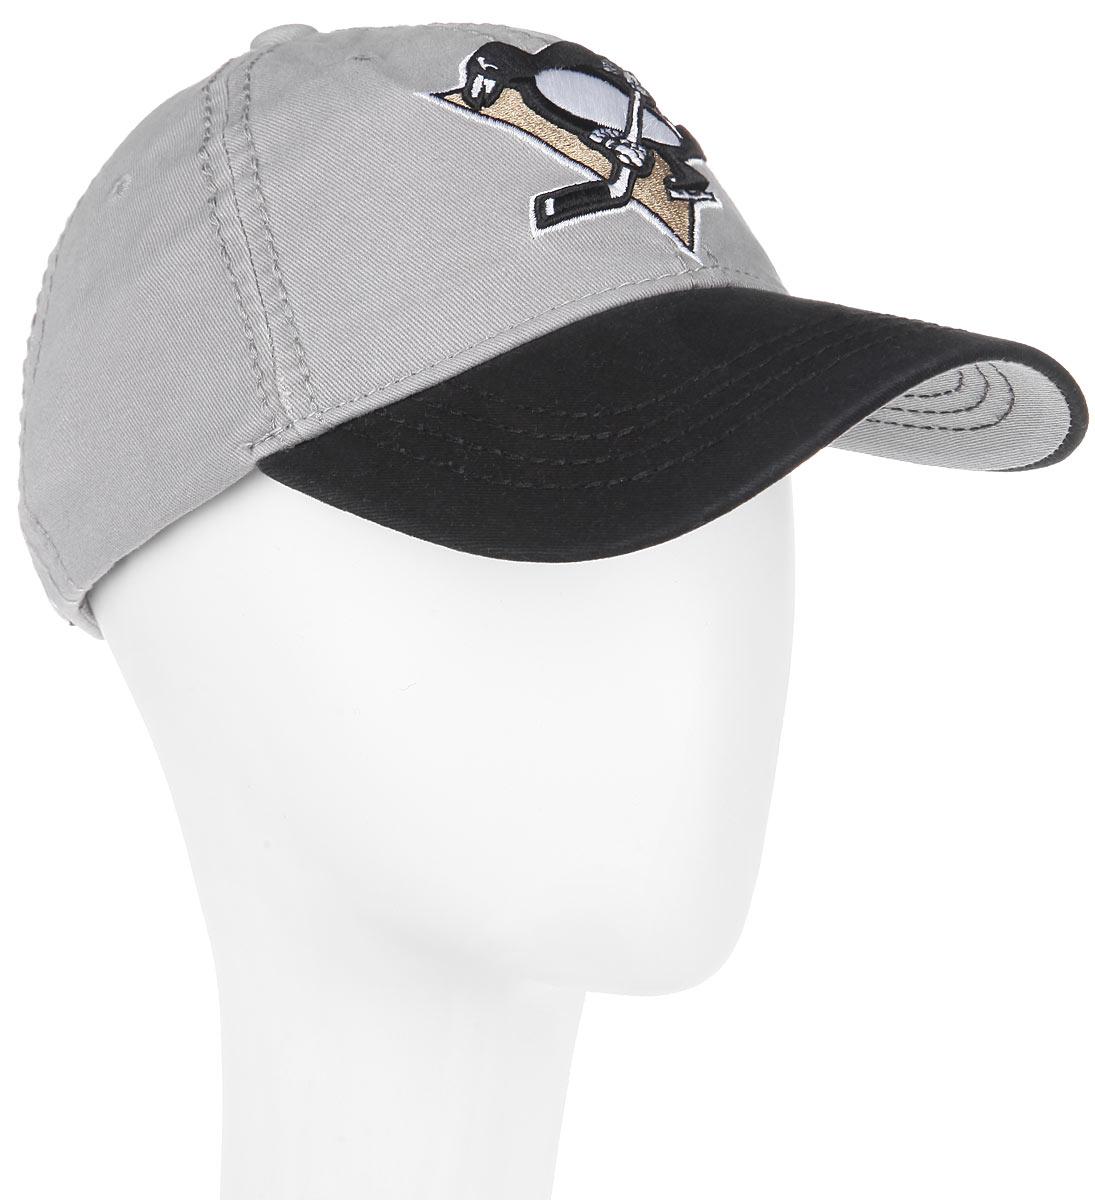 Бейсболка NHL Pittsburg Penguins, цвет: серый, черный. 29056. Размер LXL (55-58)